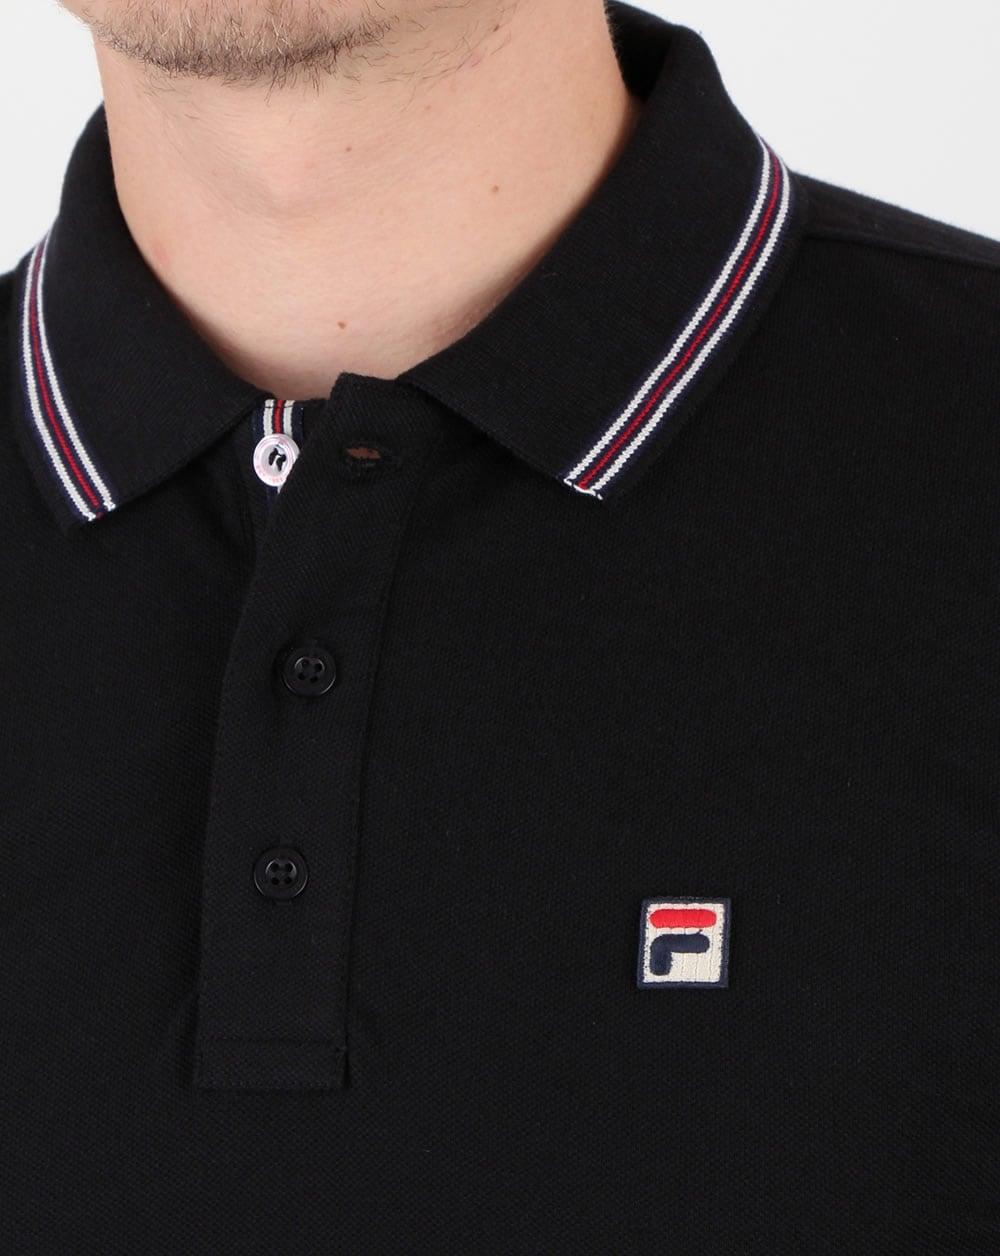 Fila Vintage Matcho 4 Polo Shirt Black